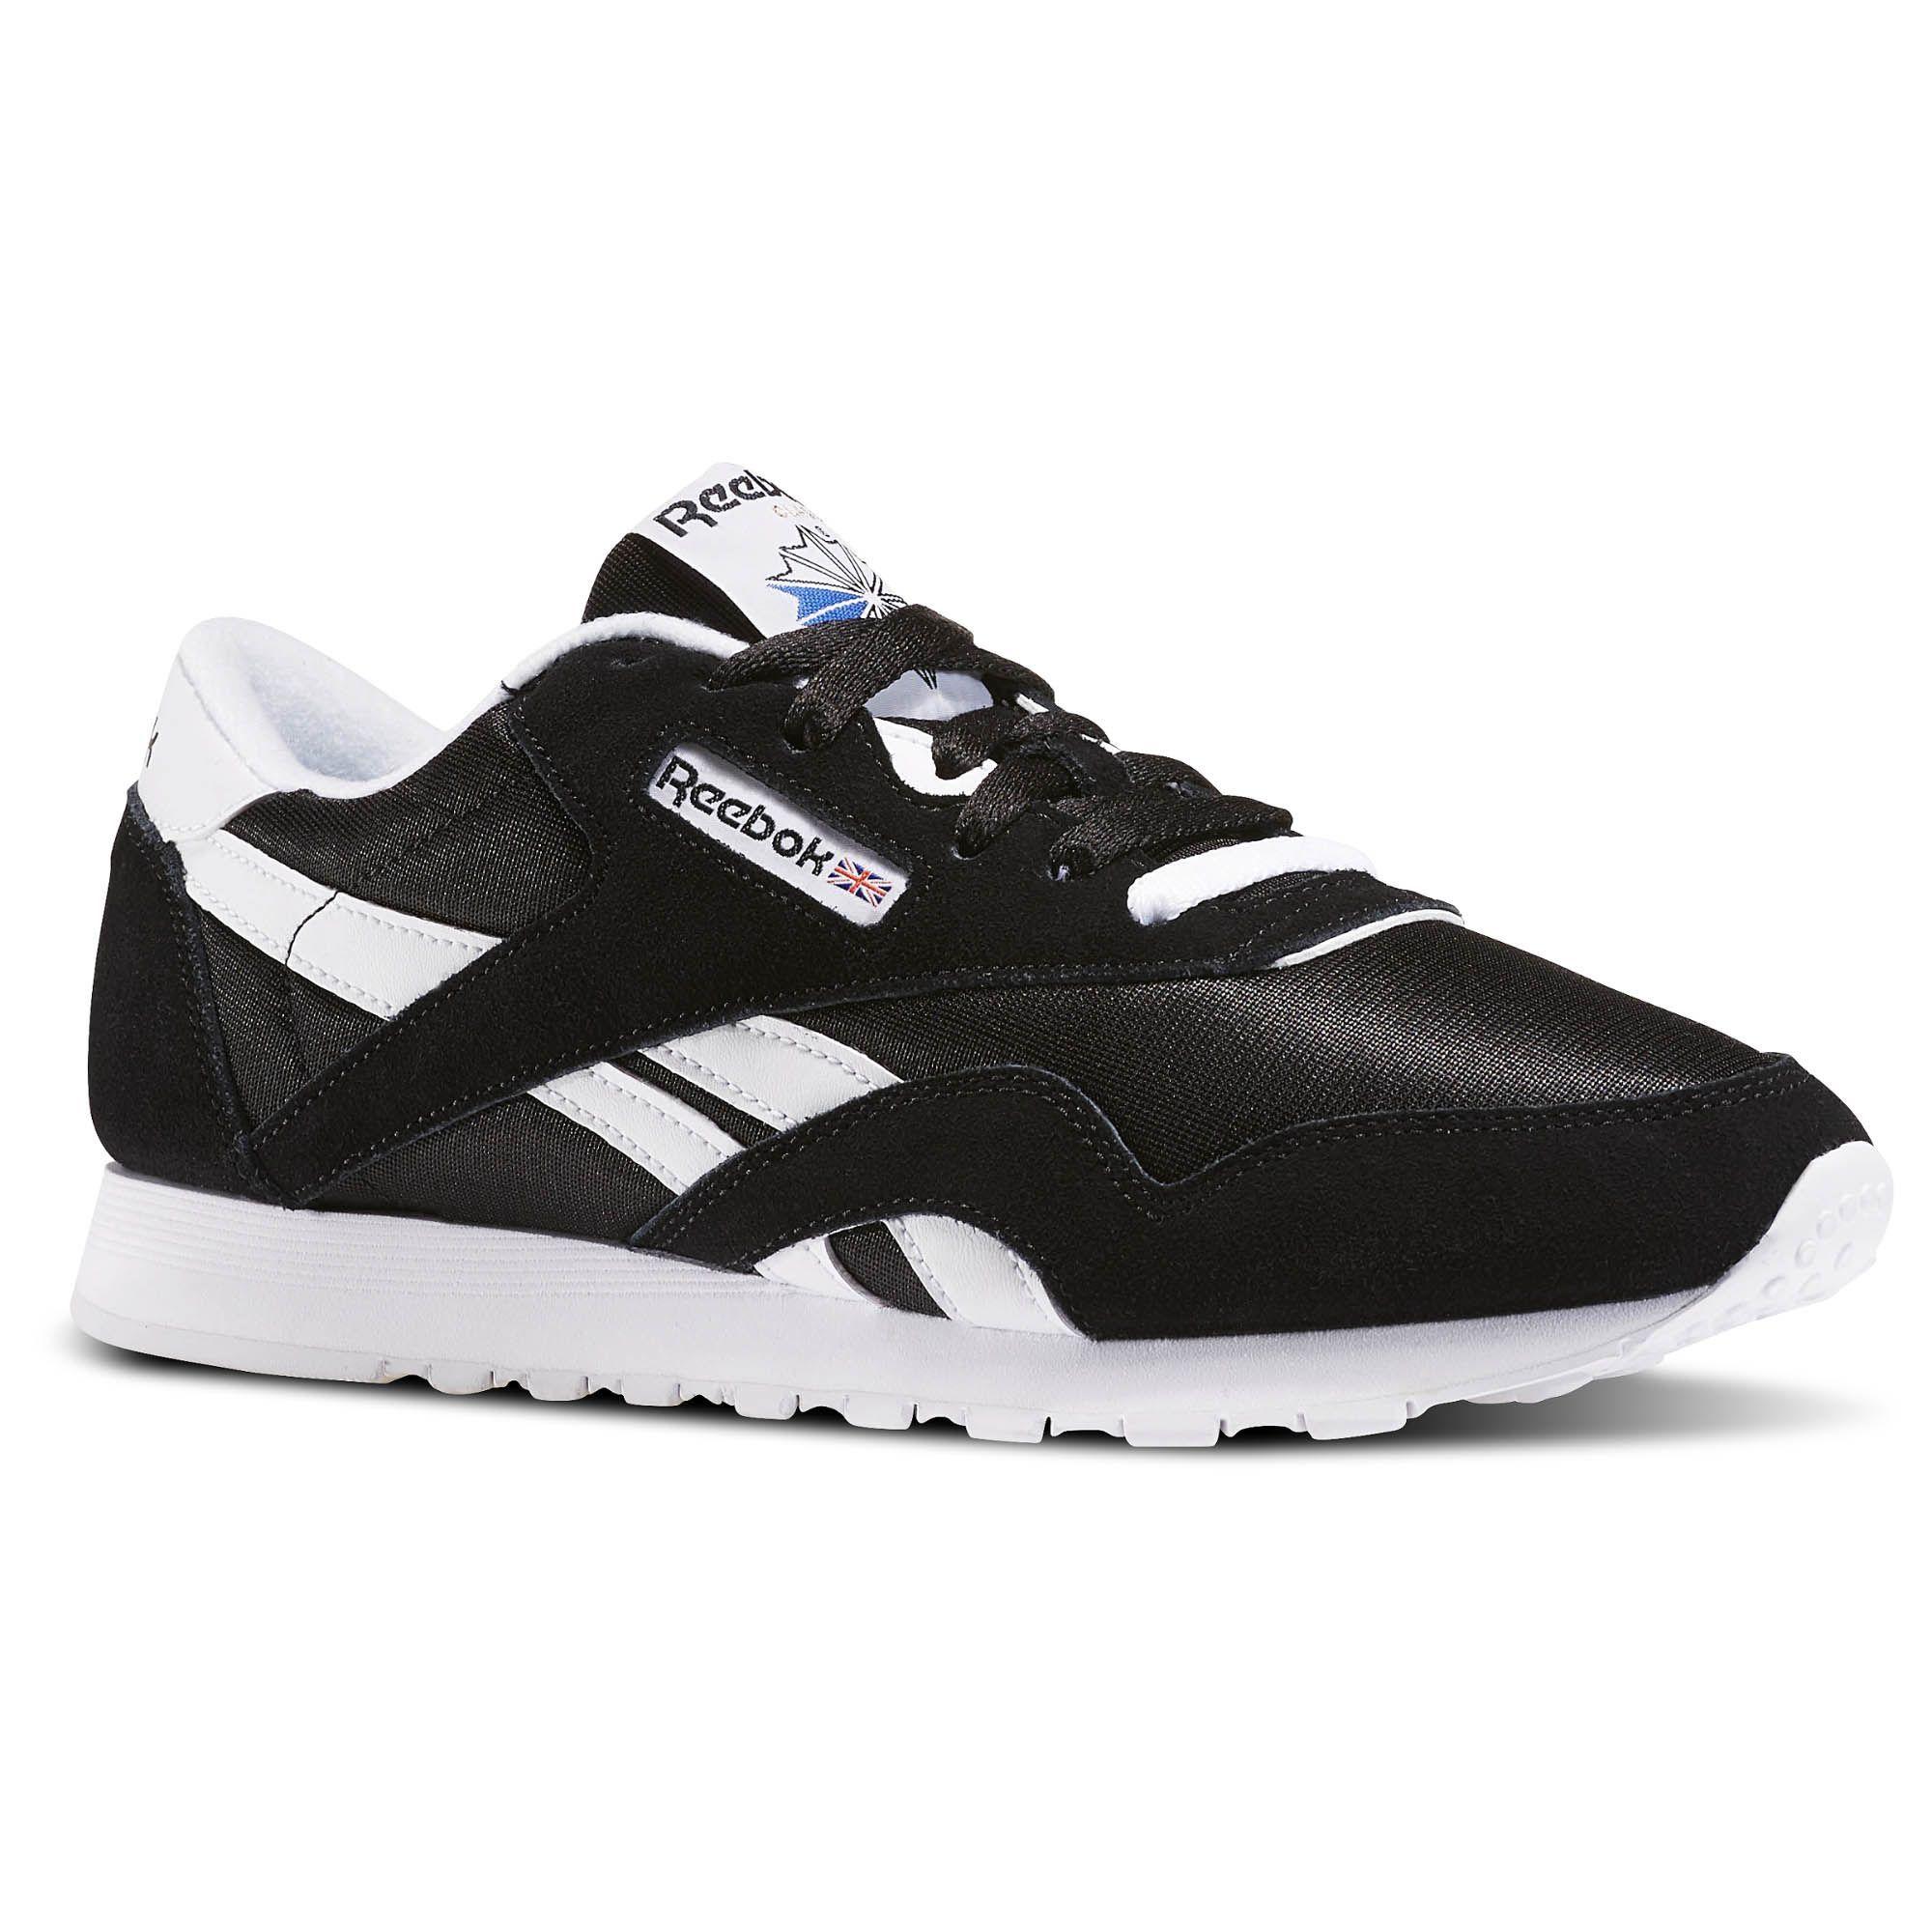 b7149f42661 Reebok Shoes Women s Classic Nylon in Black White Size 10.5 ...